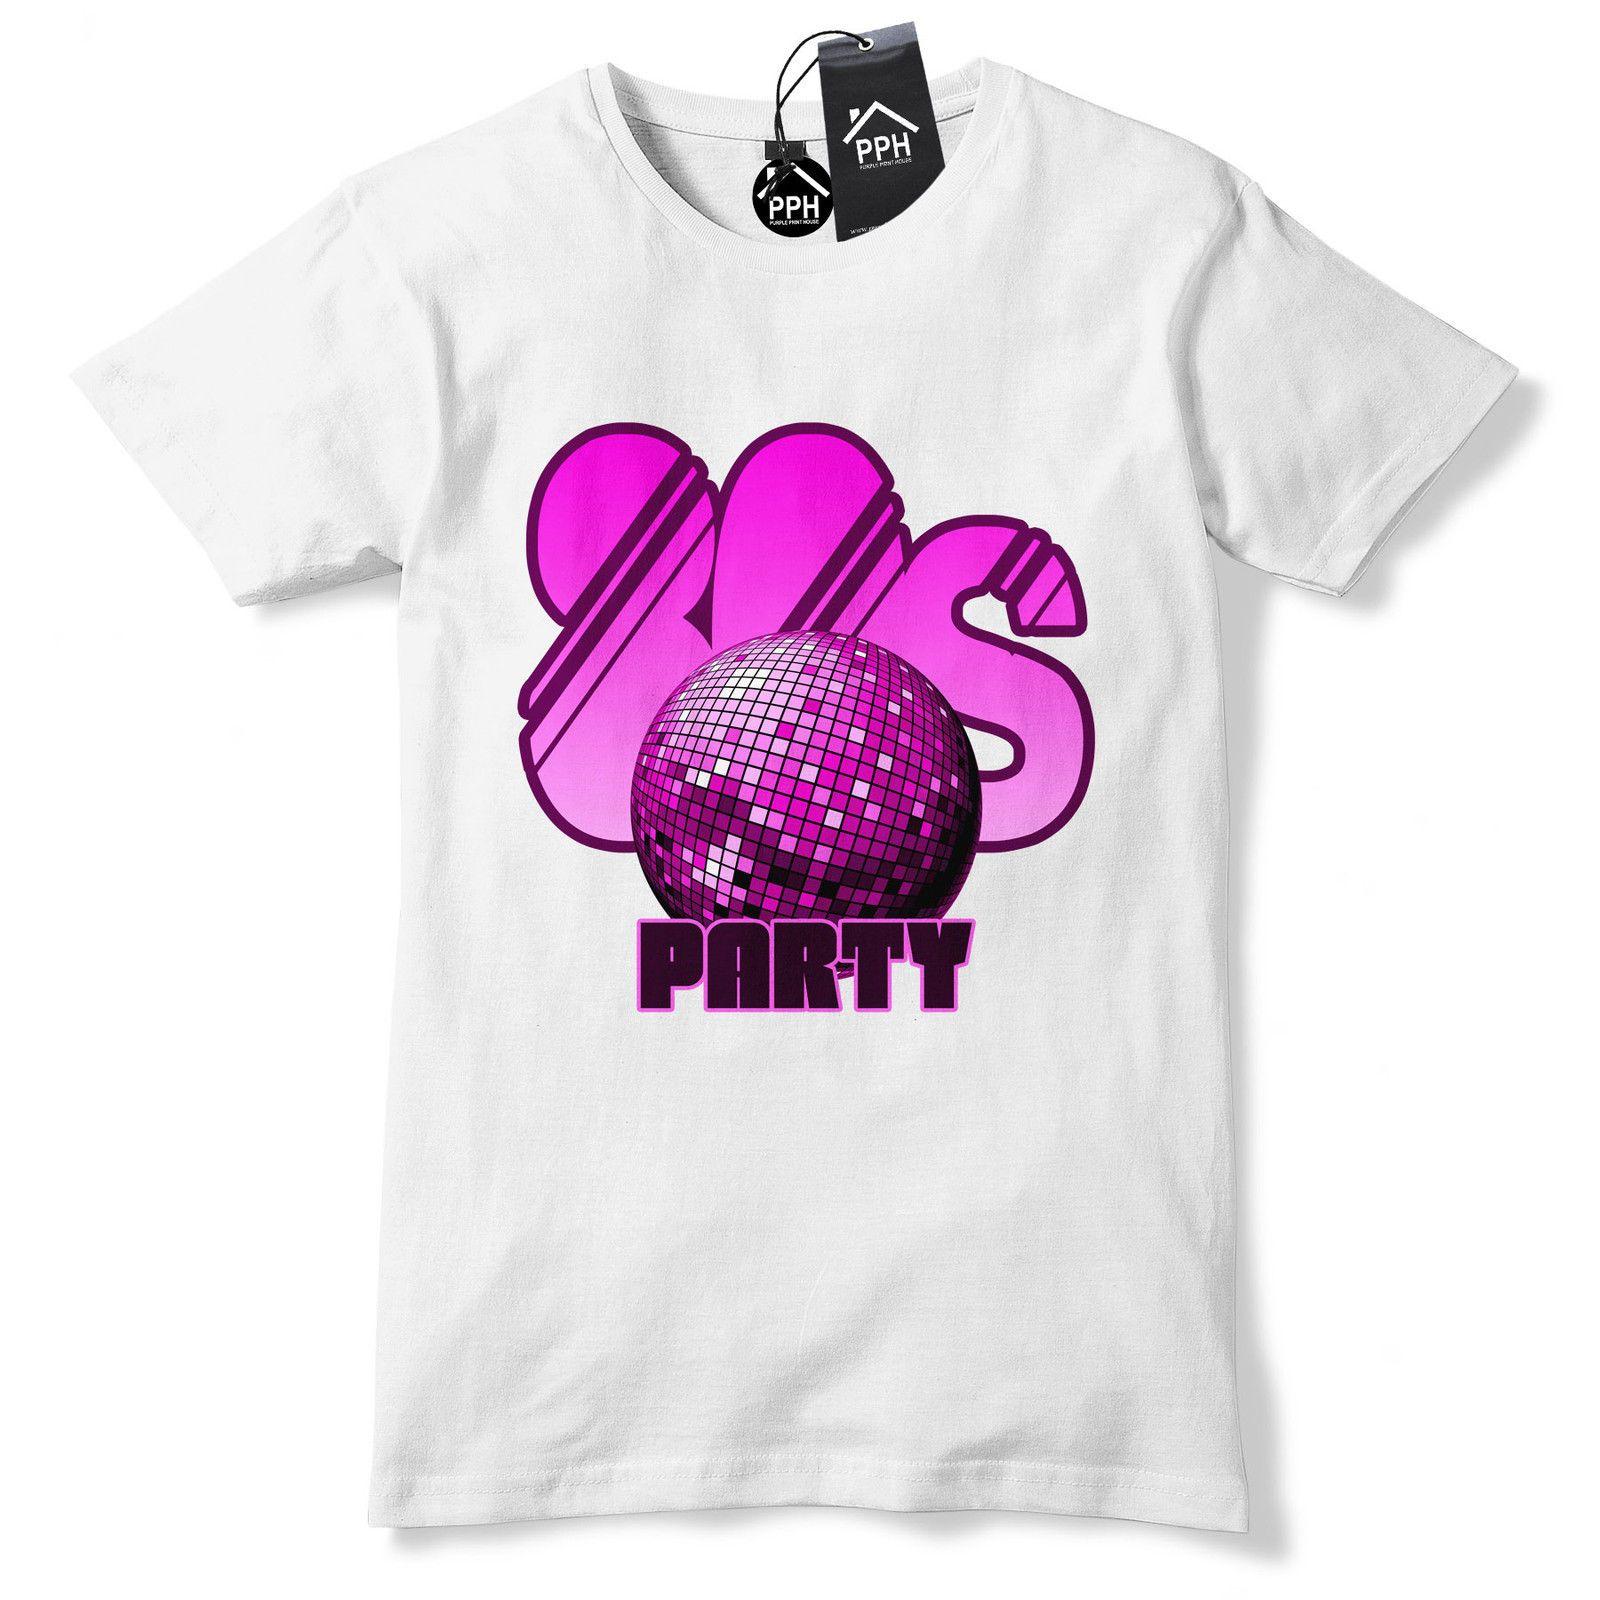 80s Disco Ball Party T Shirt Neon Punk Retro Fancy Dress Tshirt Tee